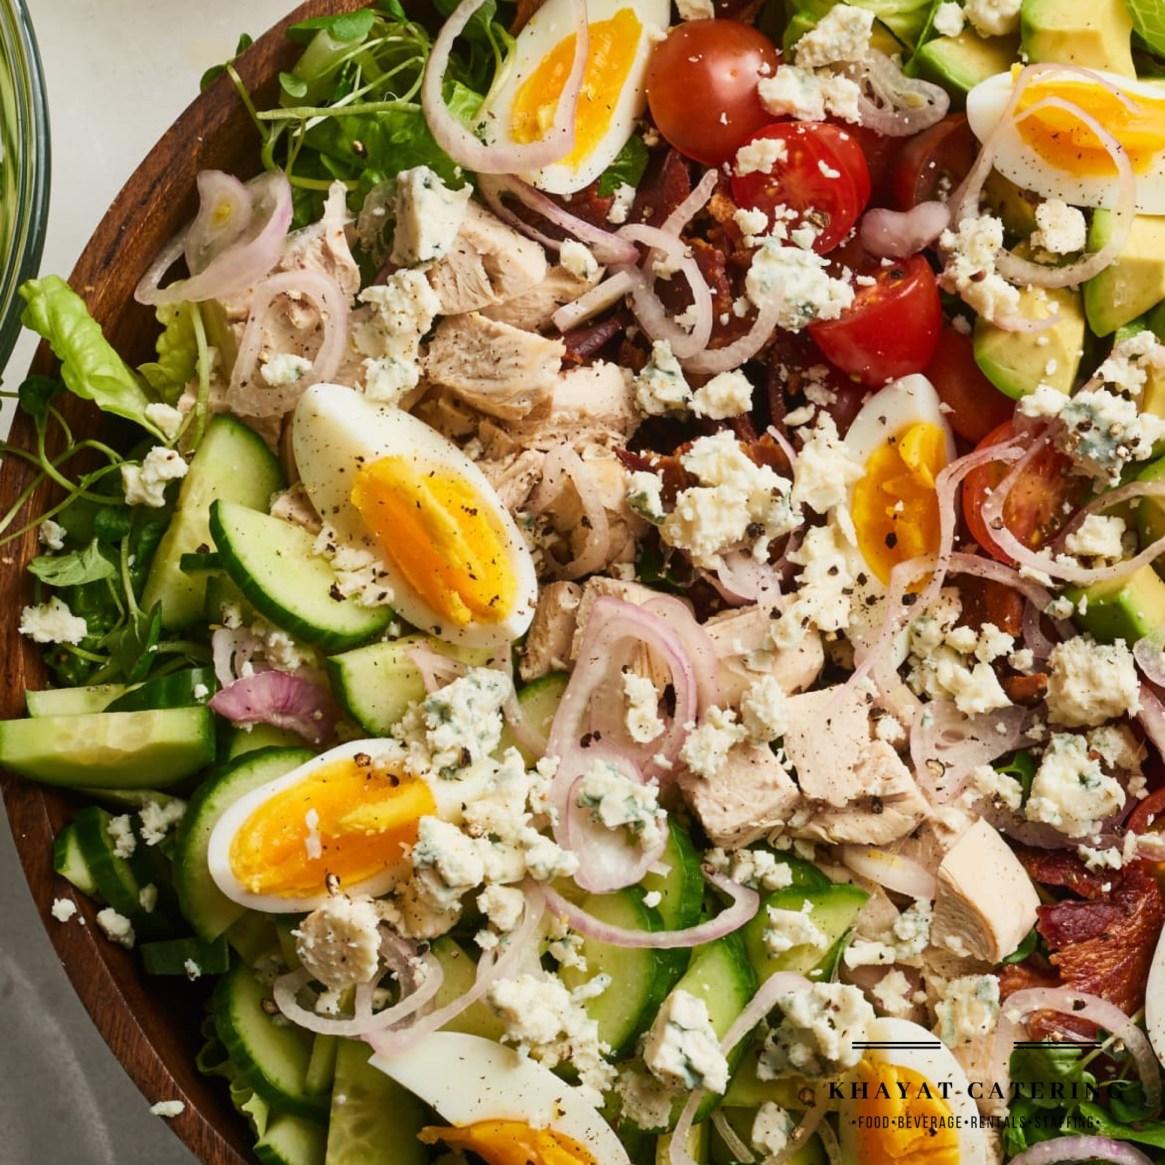 Khayat Catering california Cobb salad